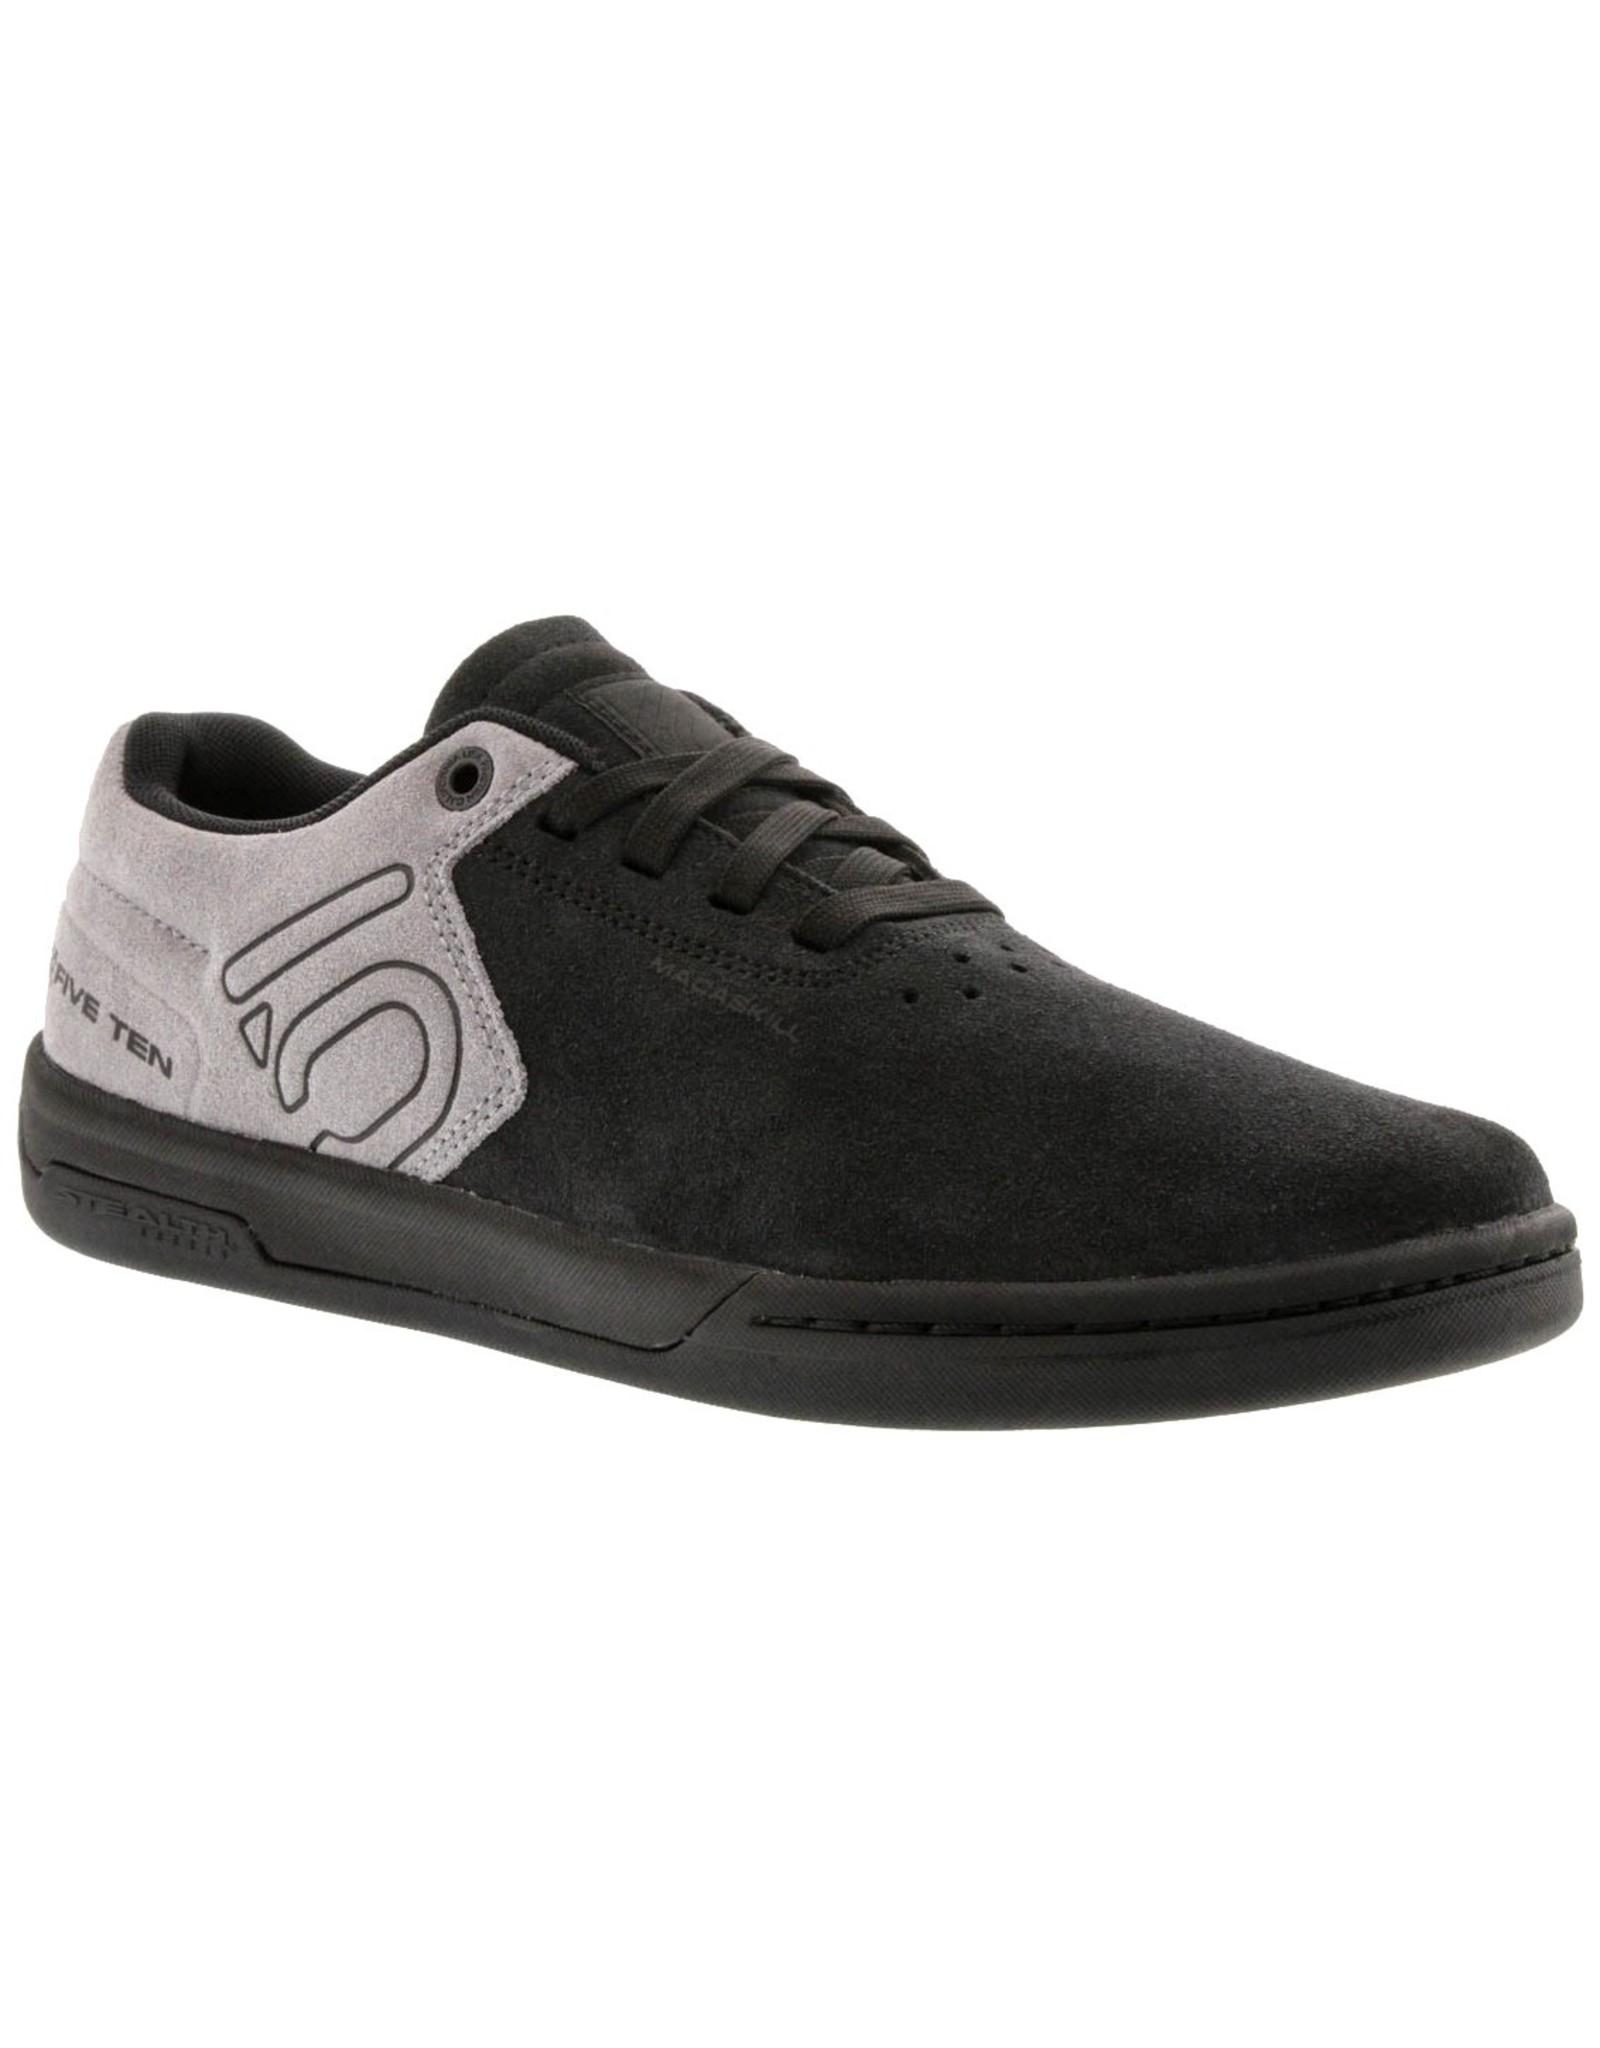 Five Ten Danny MacAskill Black/Grey